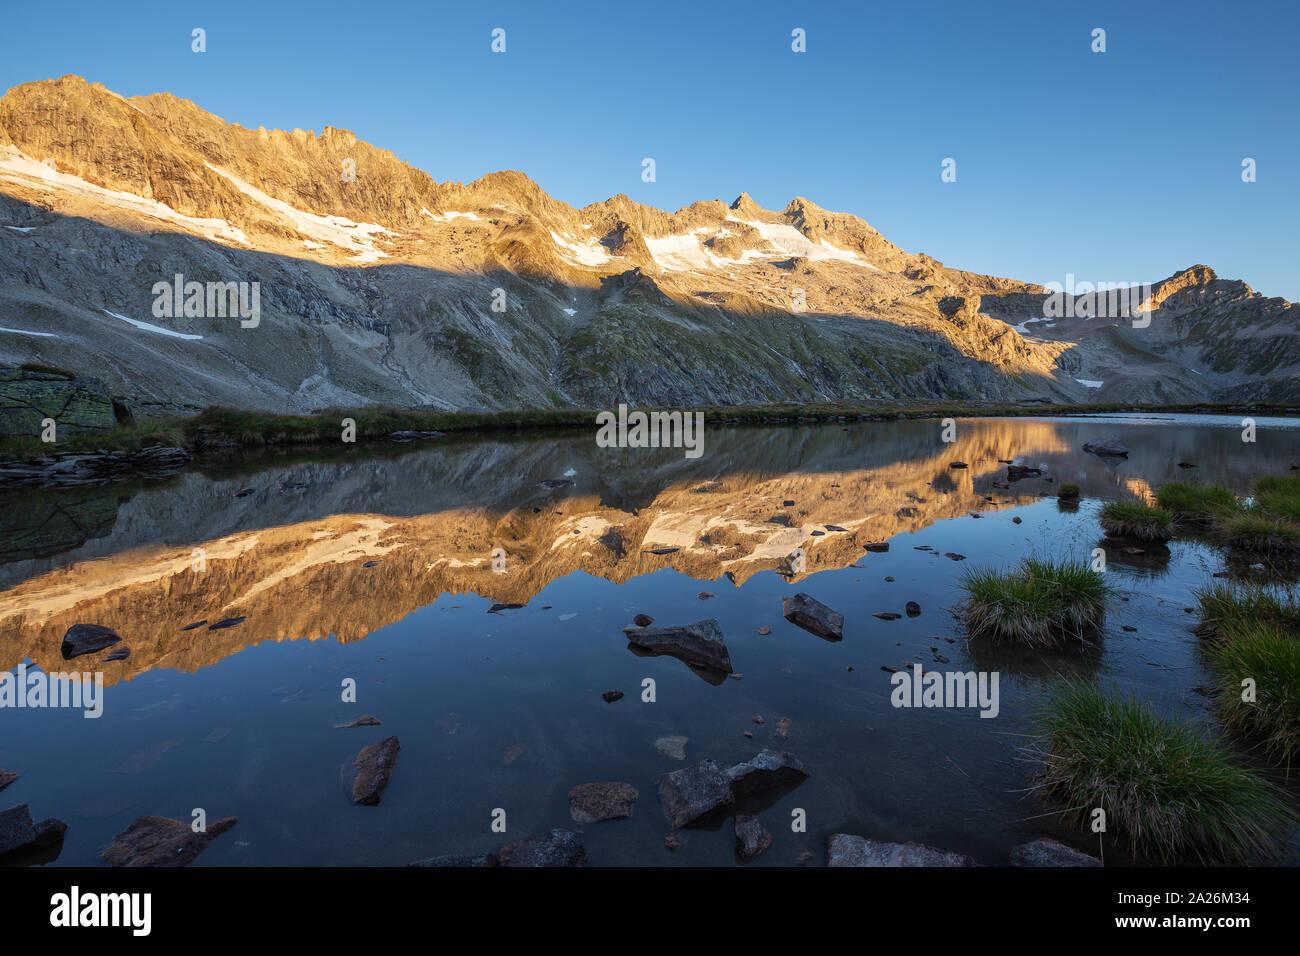 Peaks reflected on alpine lake. Reichenspitzgruppe. Reichenspitze peak. Sunrise sunlight on peaks and glaciers. Hohe Tauern Nationalpark. Stock Photo